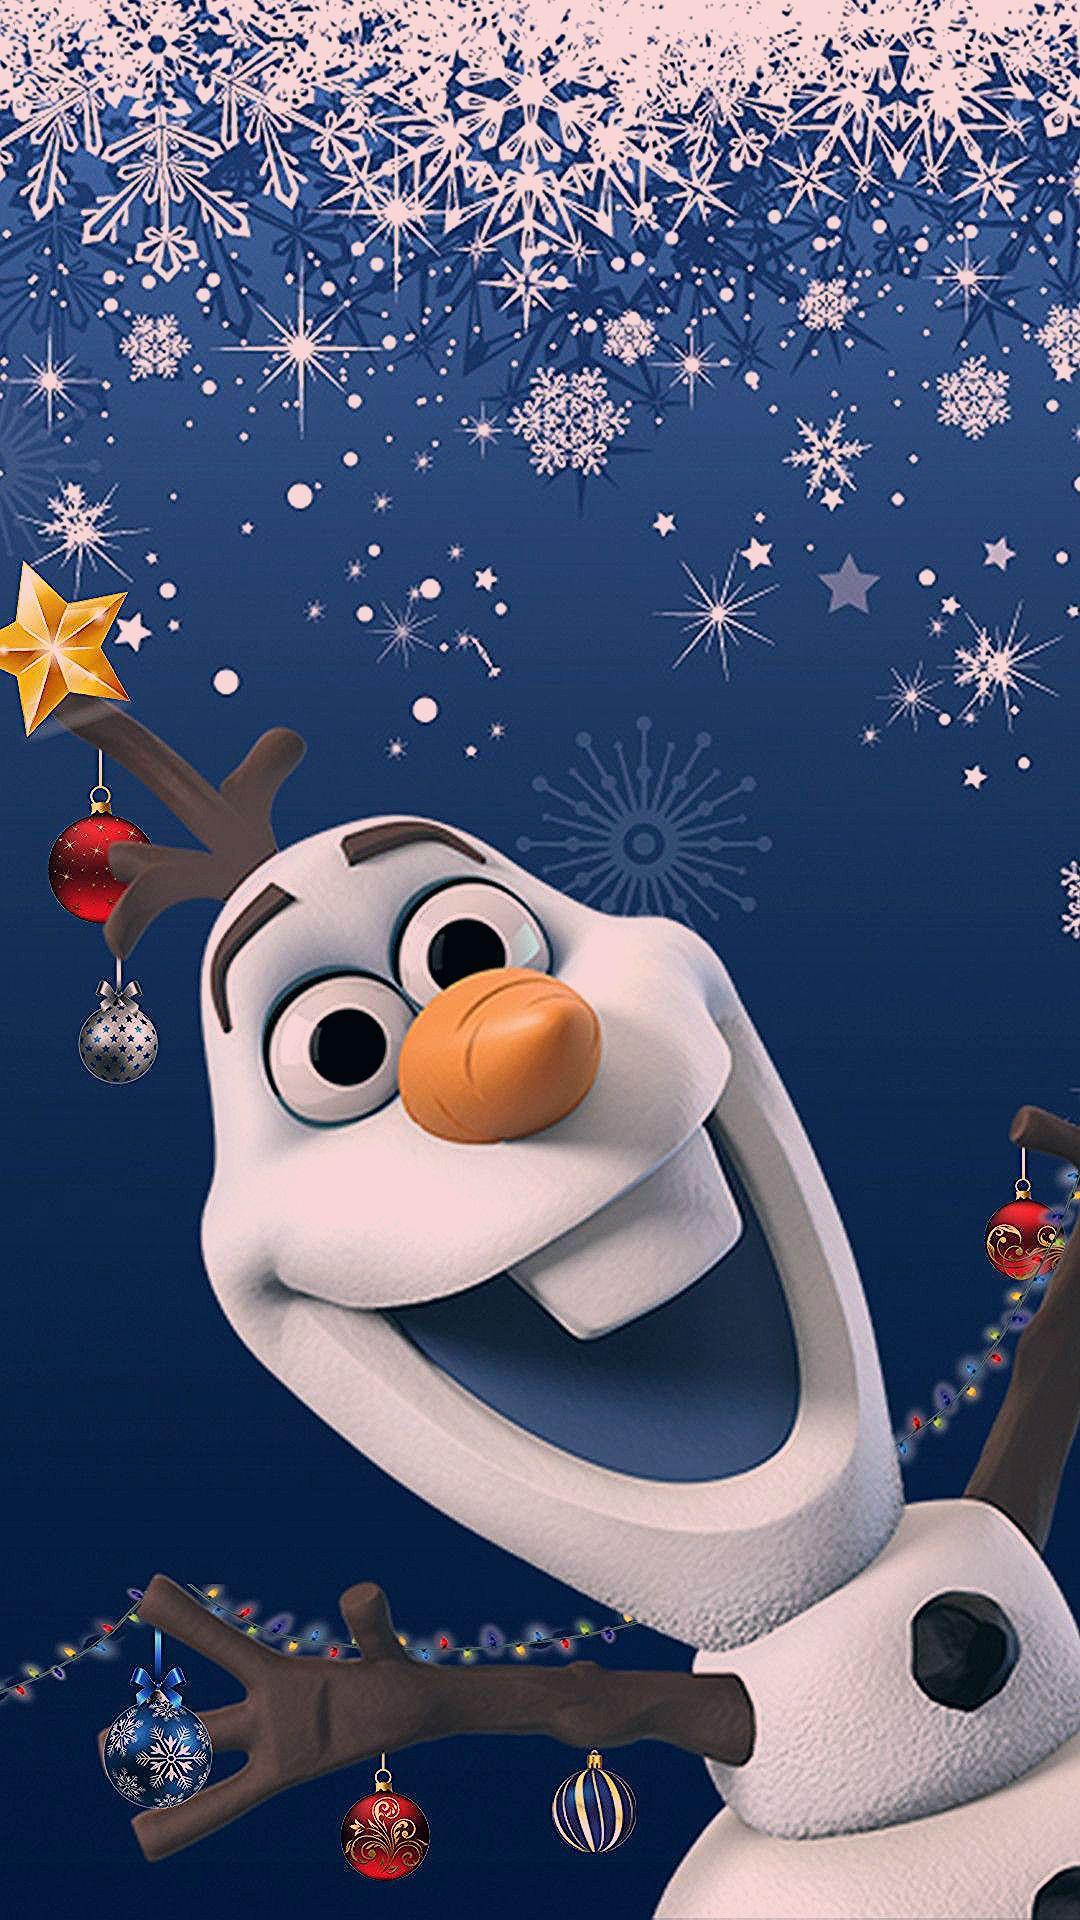 Olaf Wallpaper 65 Images Cute Christmas Wallpaper Wallpaper Iphone Christmas Cute Disney Wallpaper